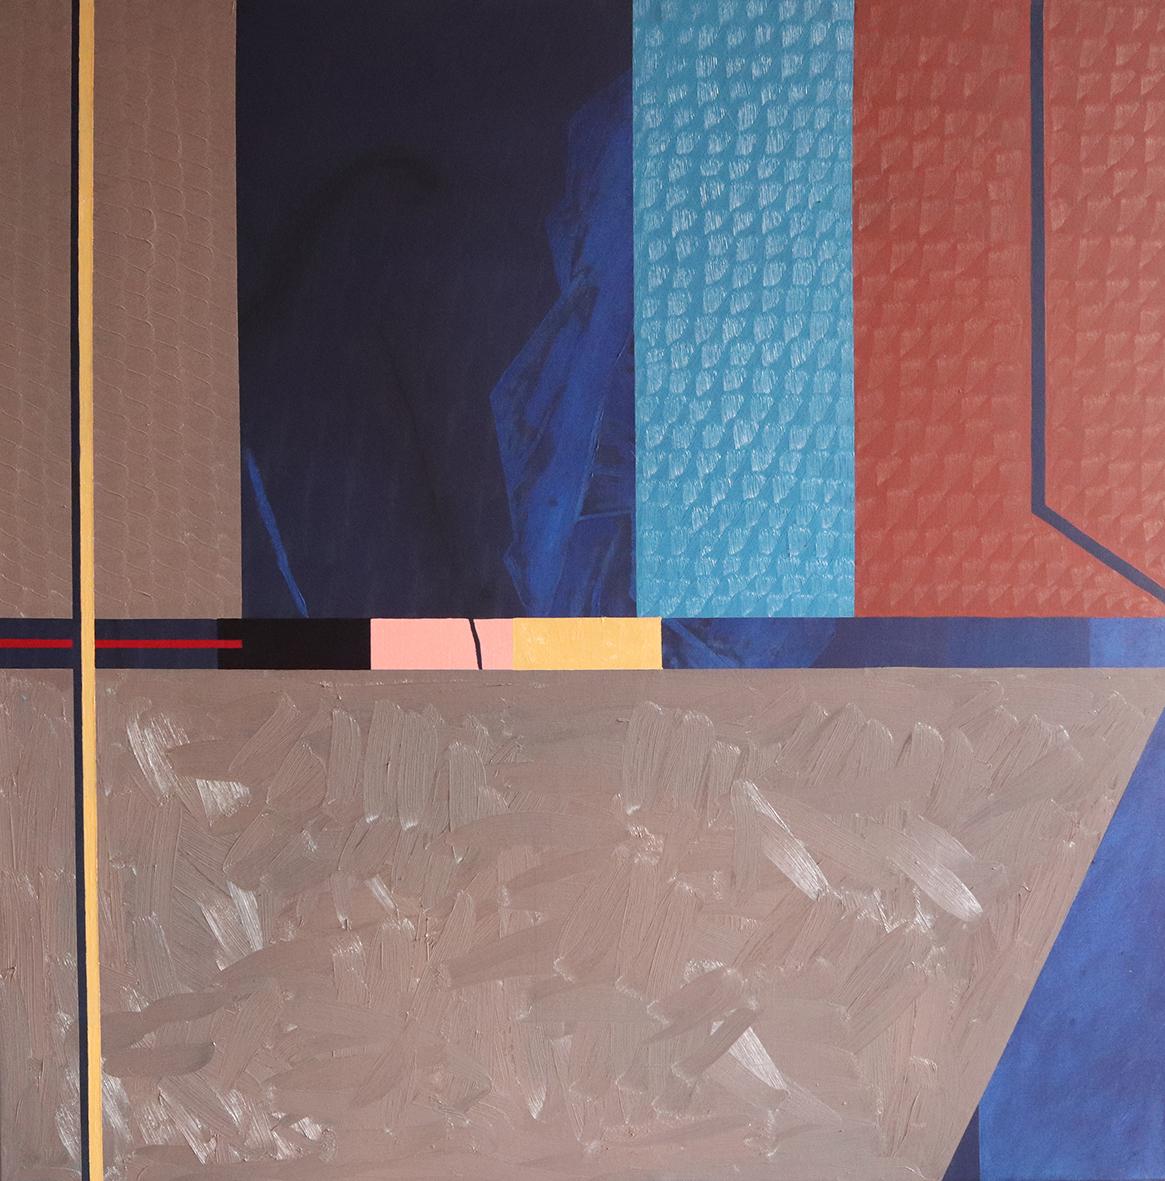 In memoriam nª2 (100x100cm) 2007-2020